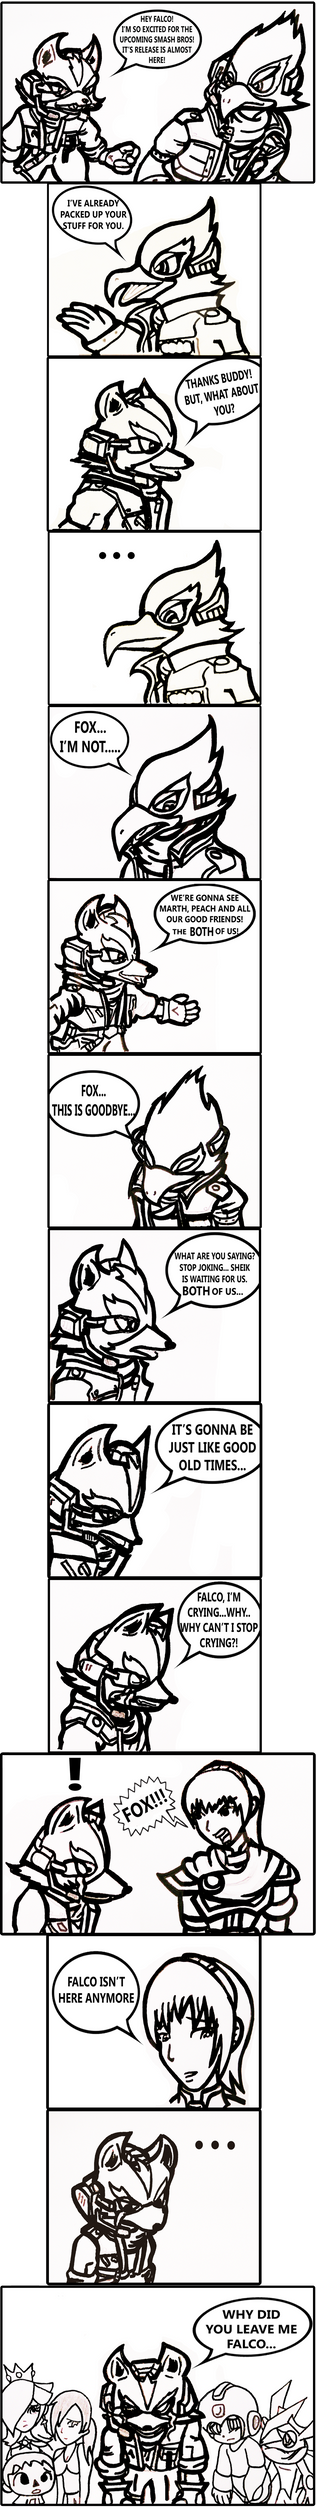 Goodbye Falco (SSB4 What if) by PichuThePokemon